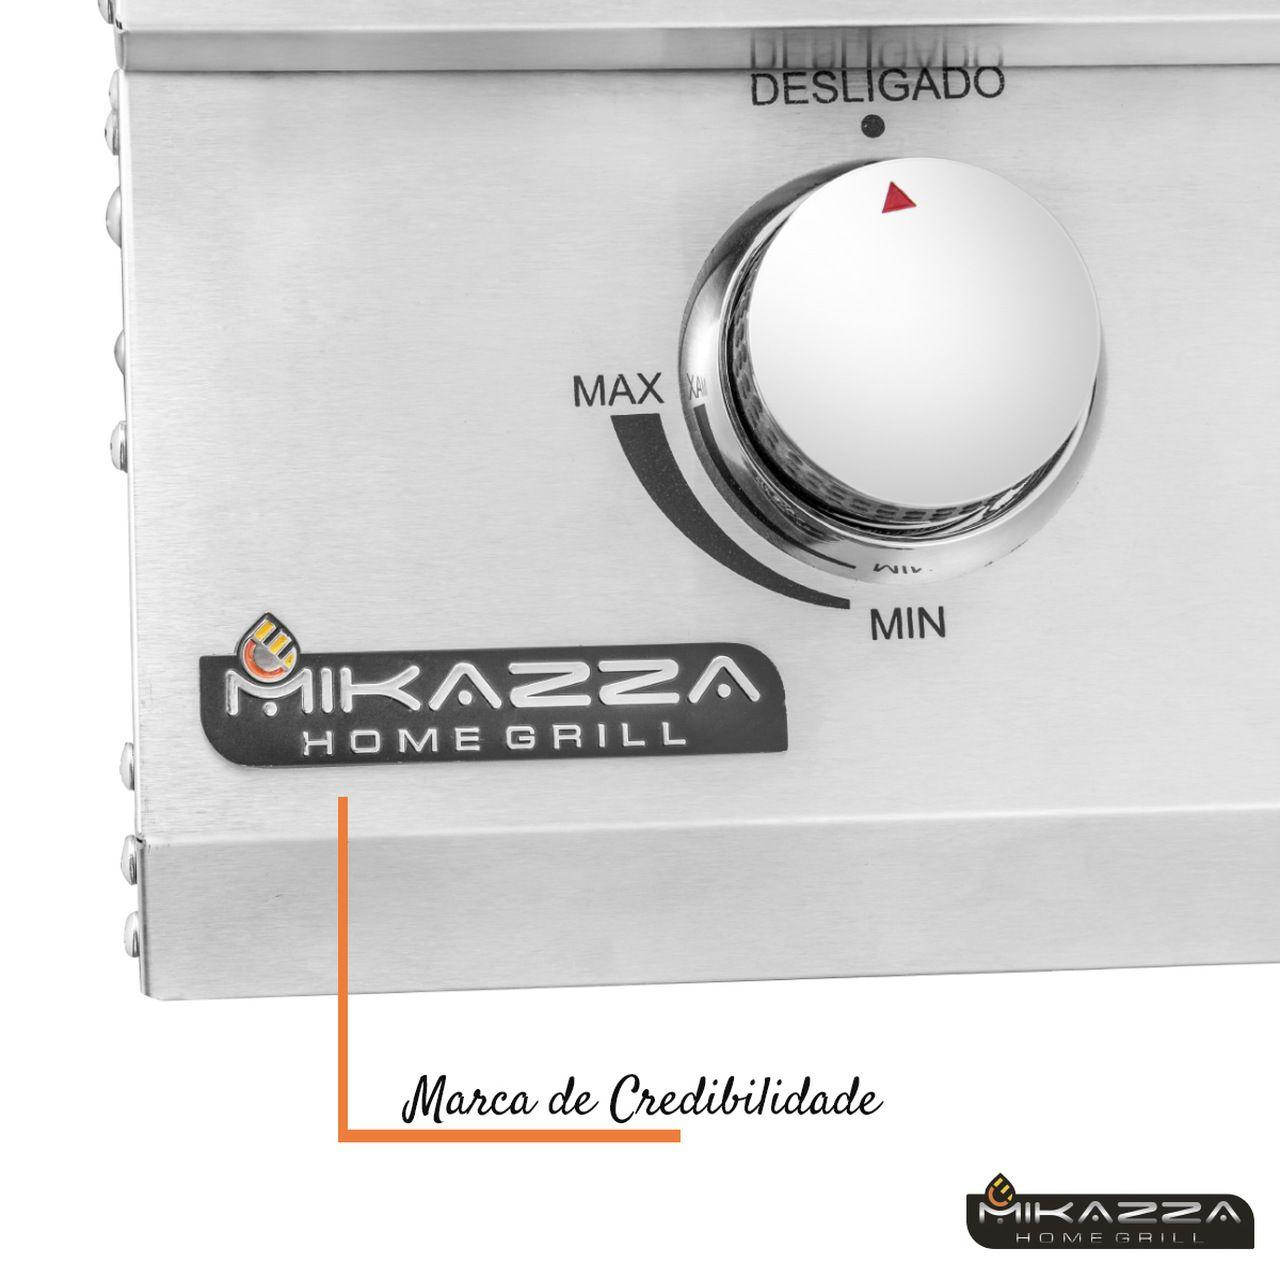 Churrasqueira à Gás Embutir Mikazza Pro 5 + Capa + Espeto + Bone